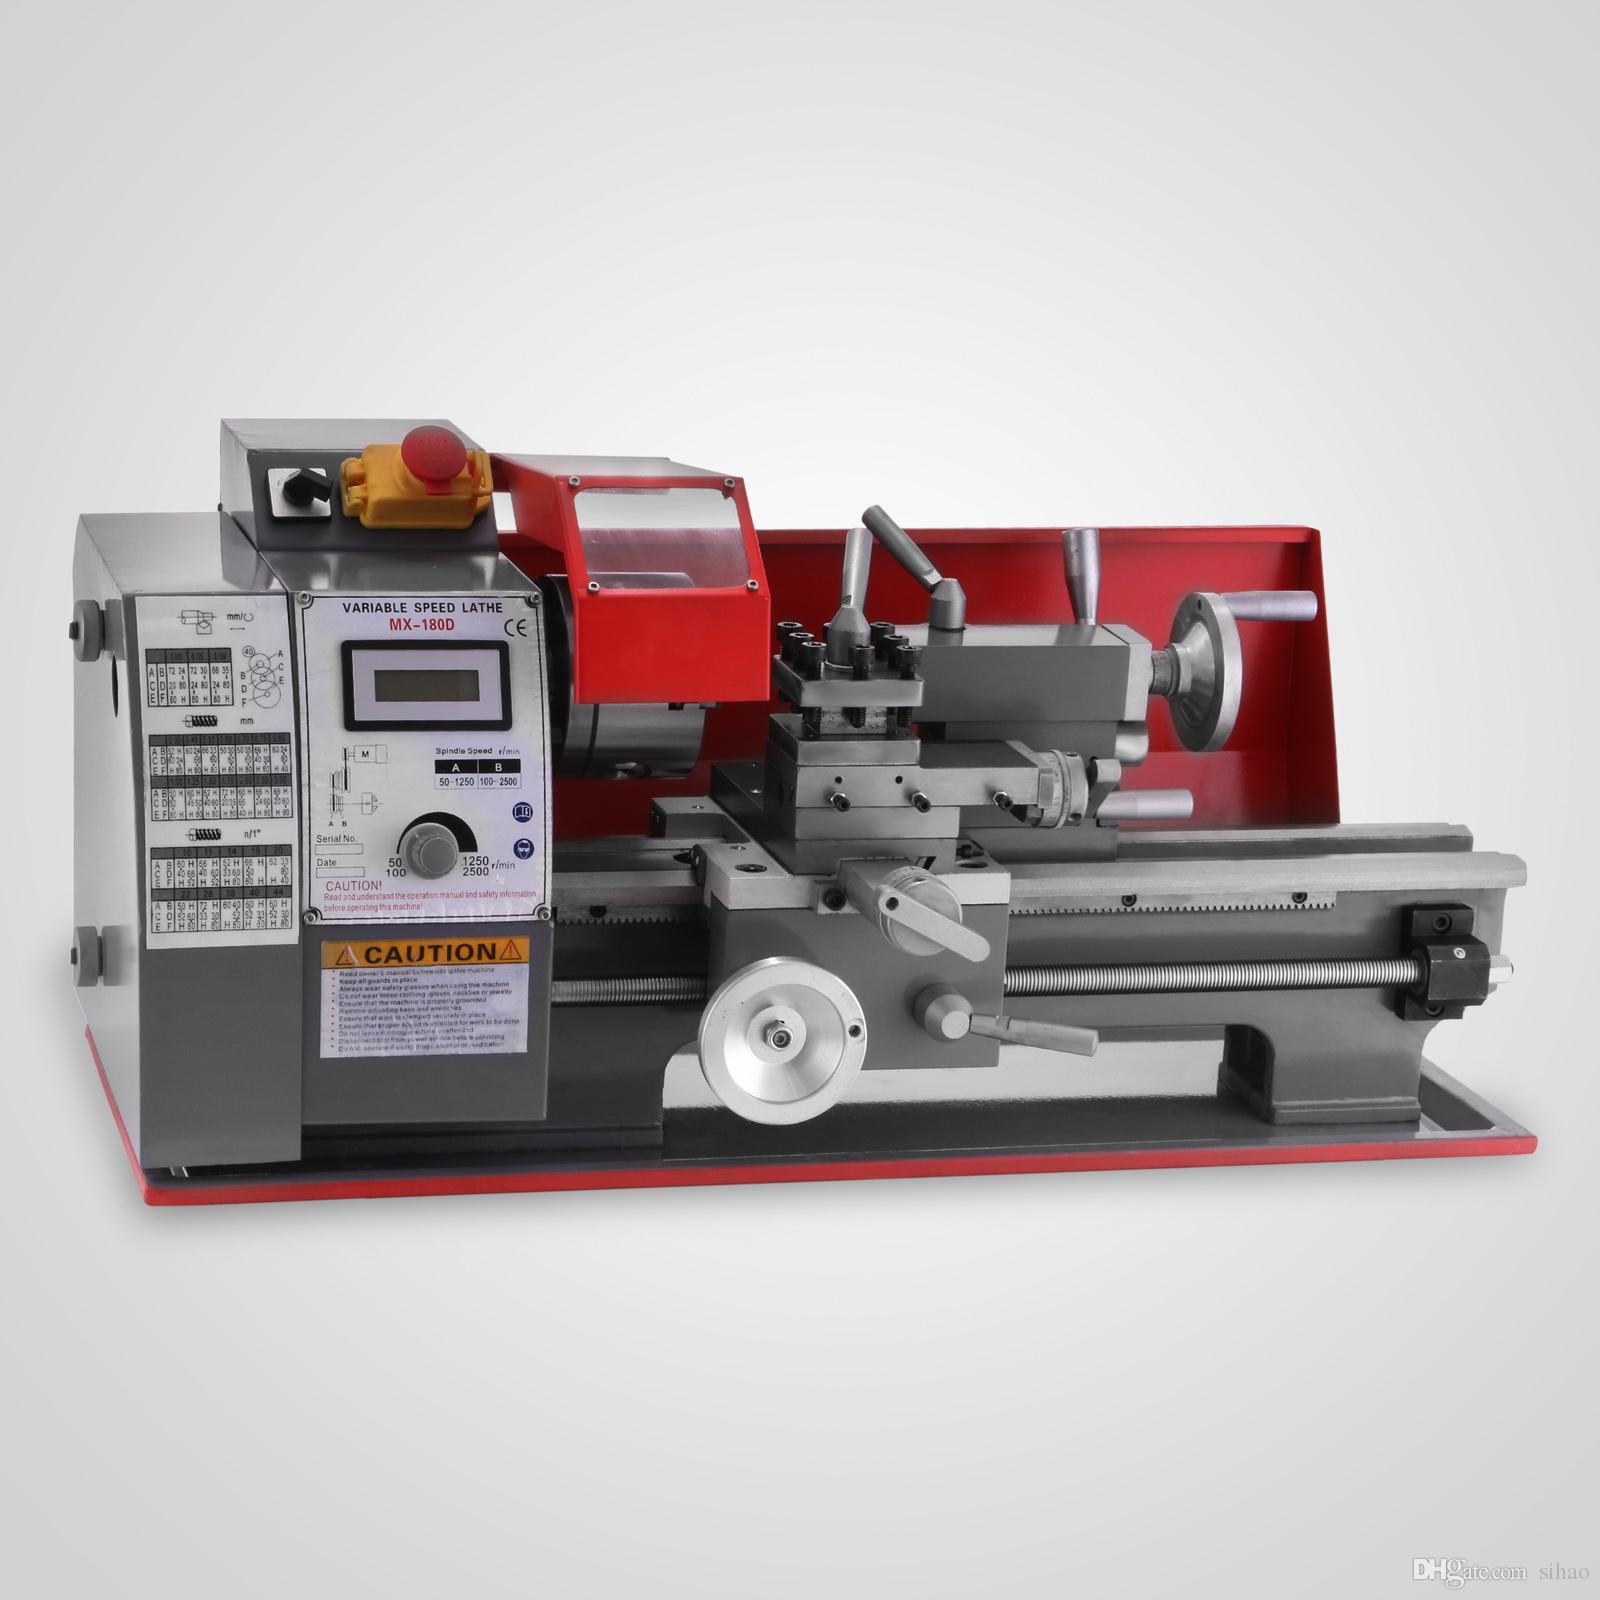 Factory price !!! 600W Top one Sales volume Metal Mini Turning Lathe  Machine Motorized Metalworking DIY Wood Tool Universal